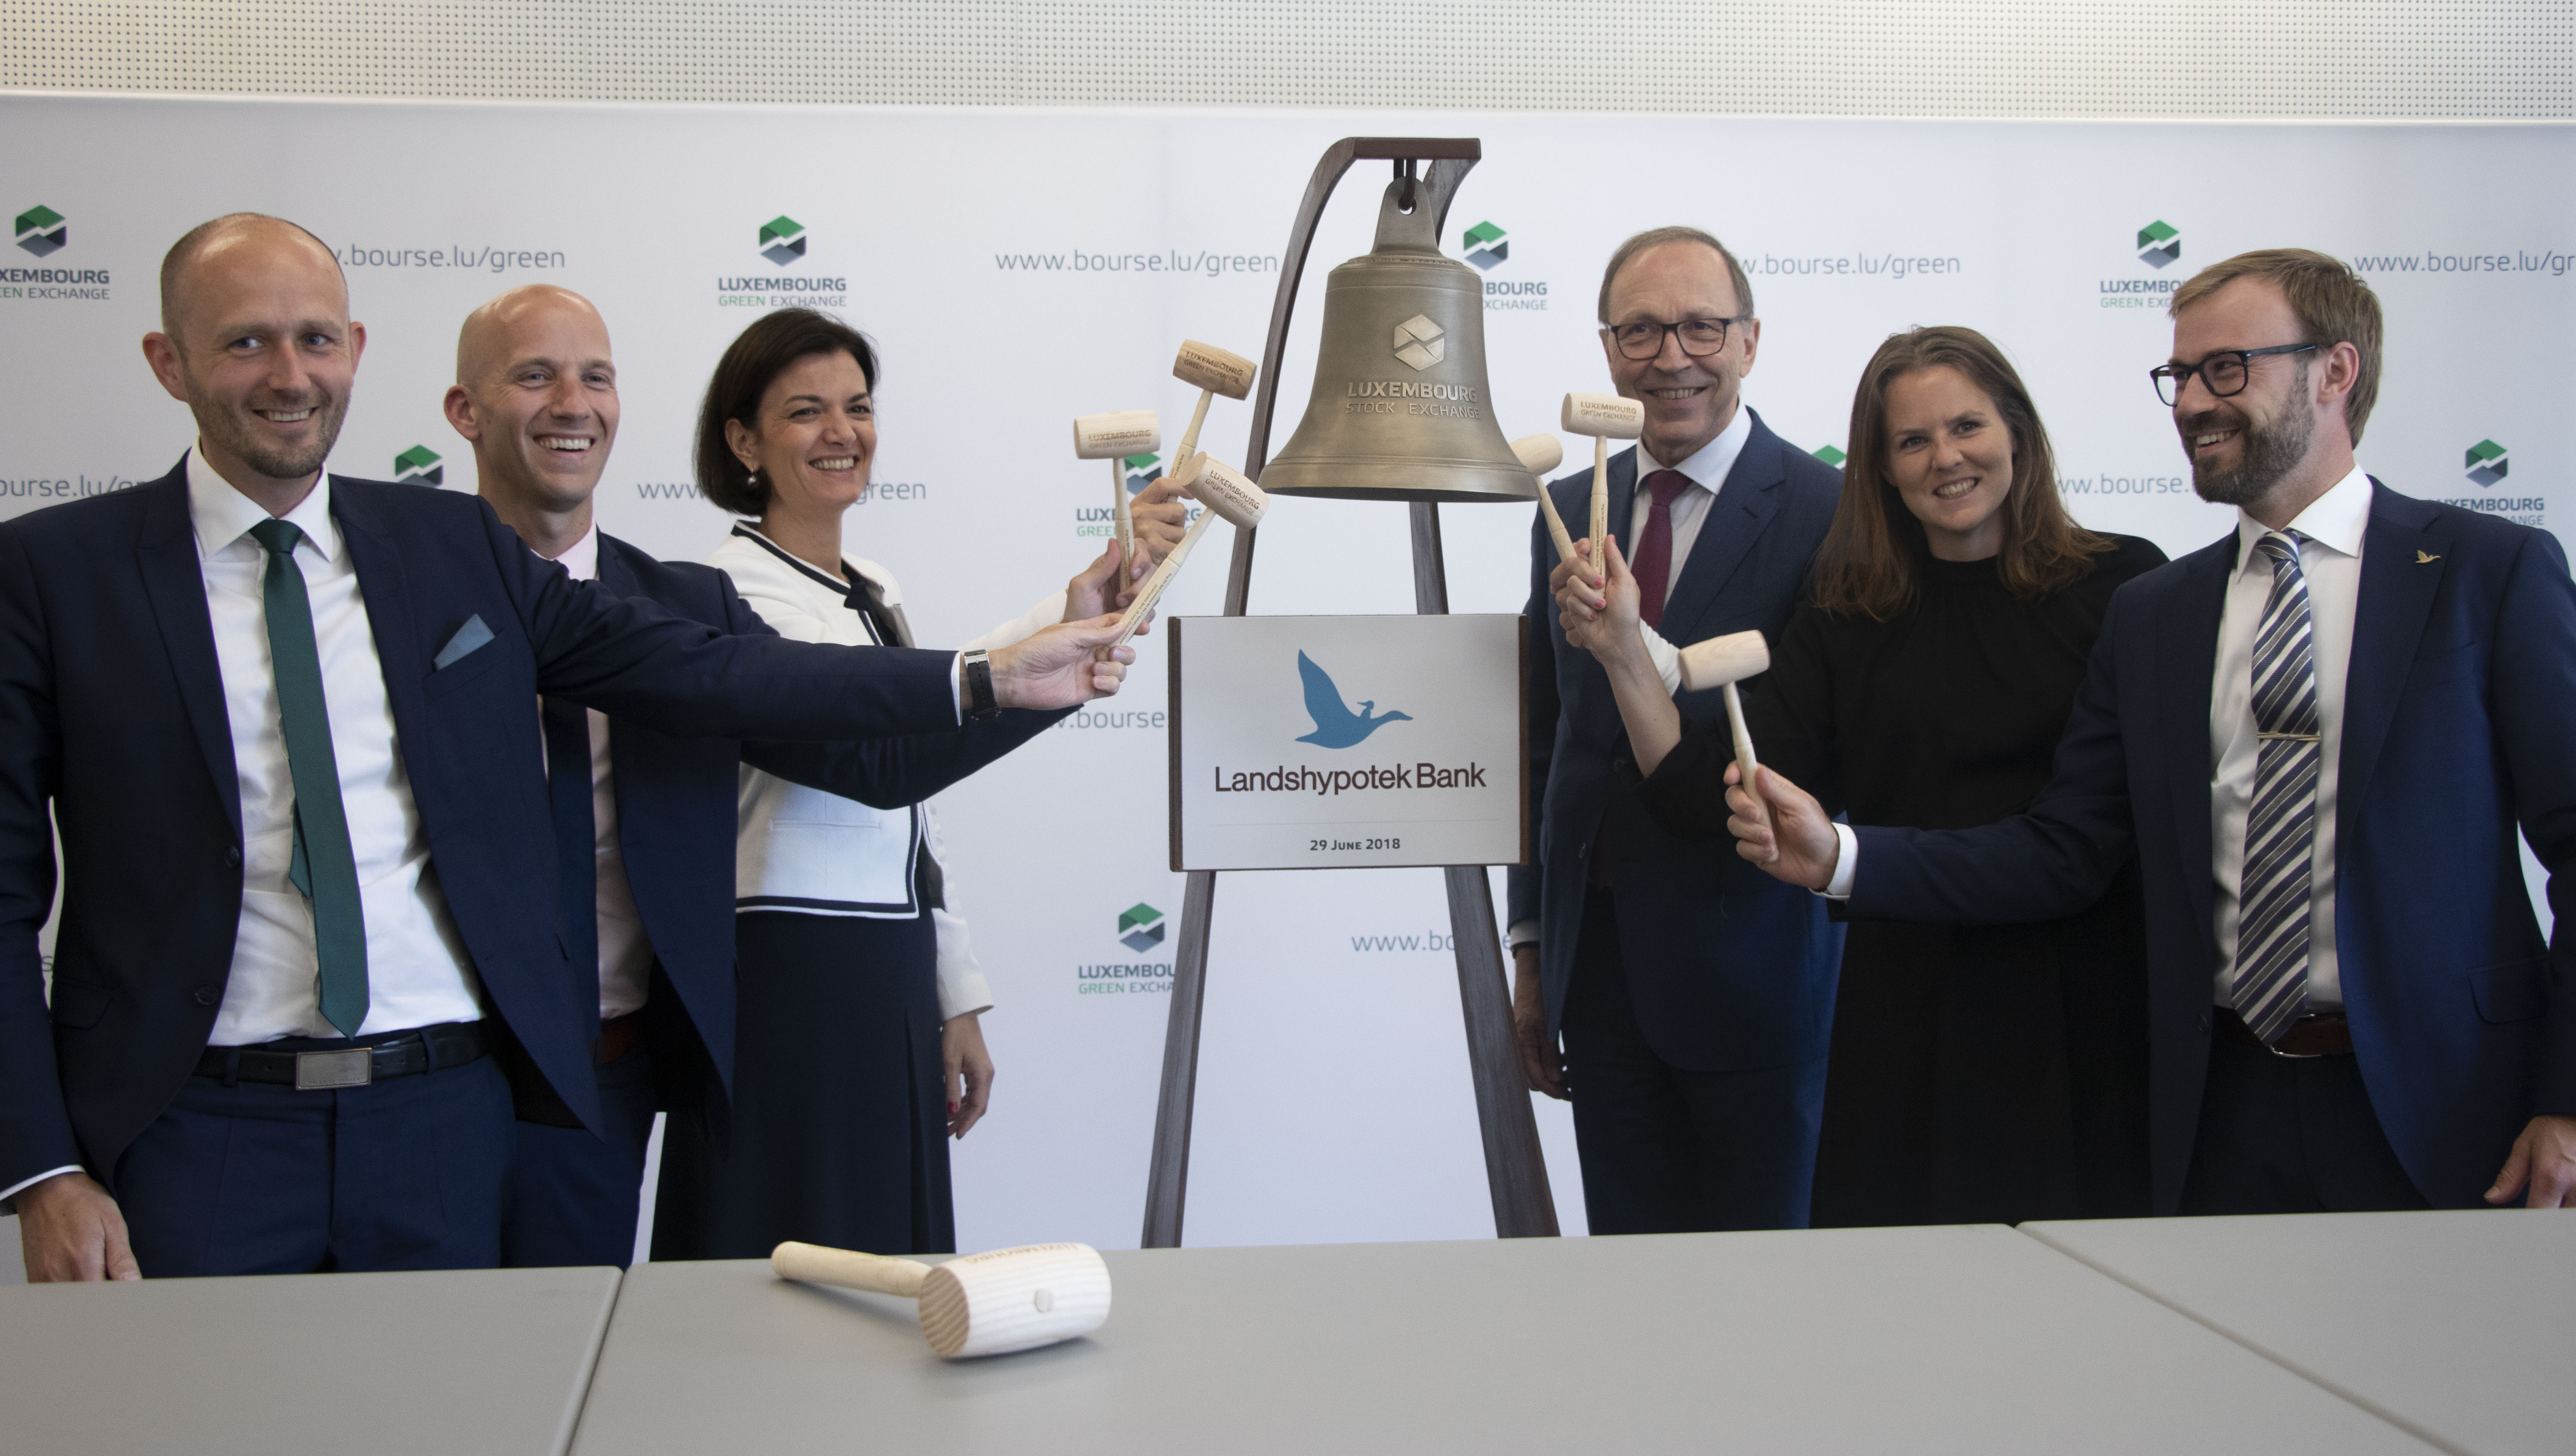 news-HP-LUXSE-Landshypotek_bank_introduces_forests.png